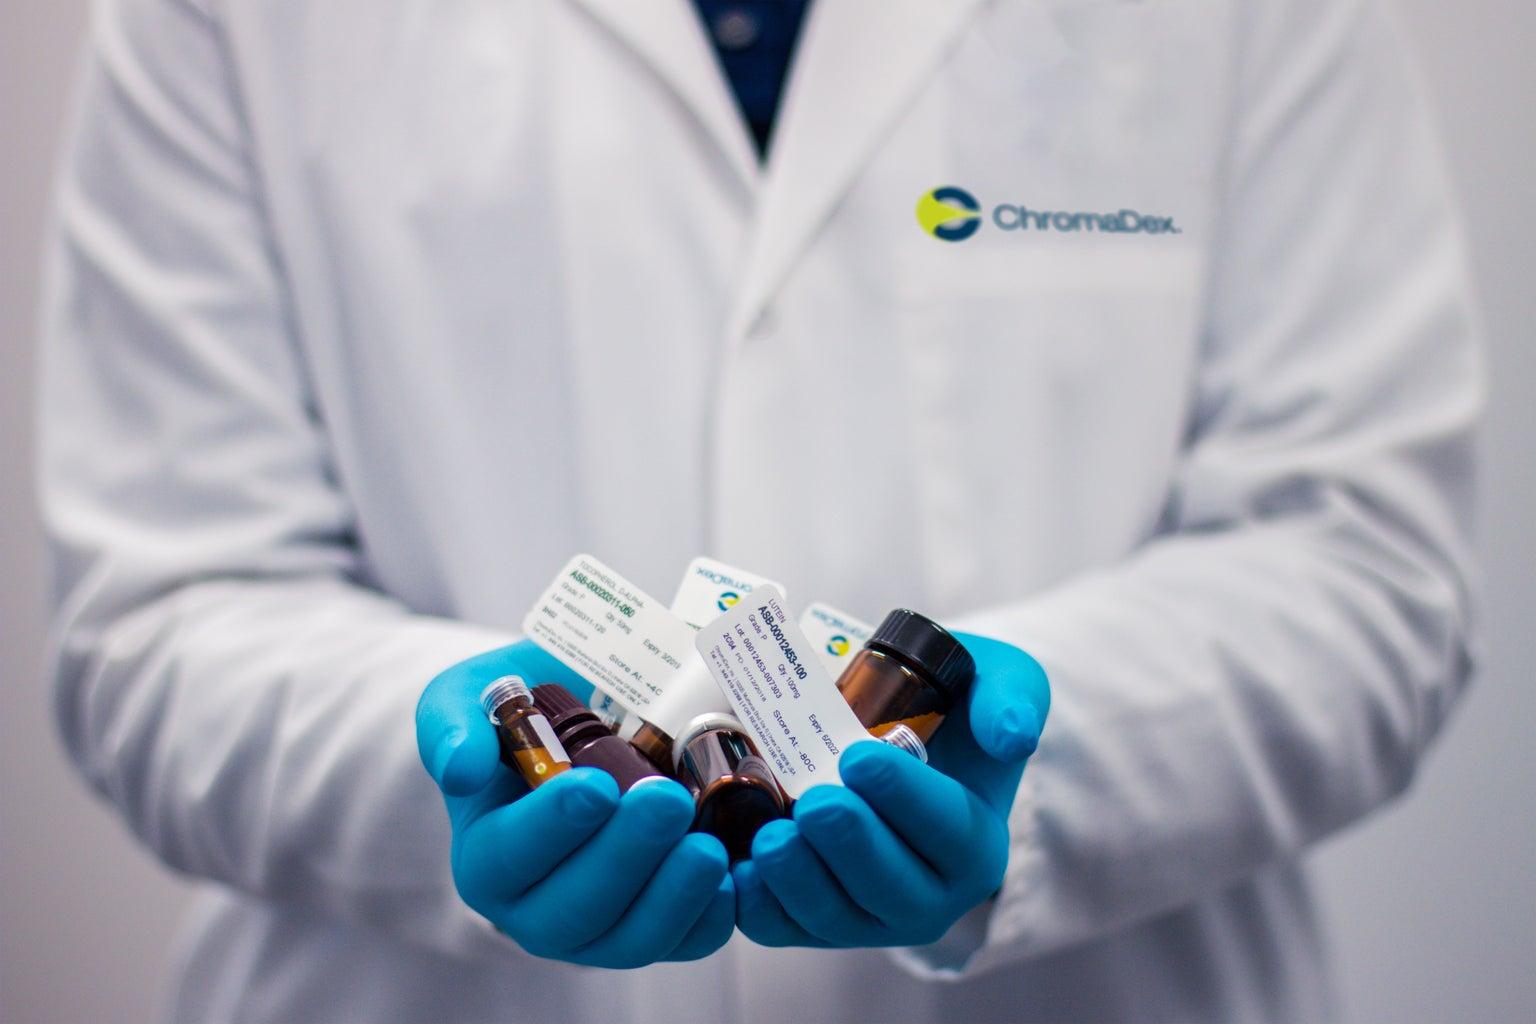 Pharmacist holding medication